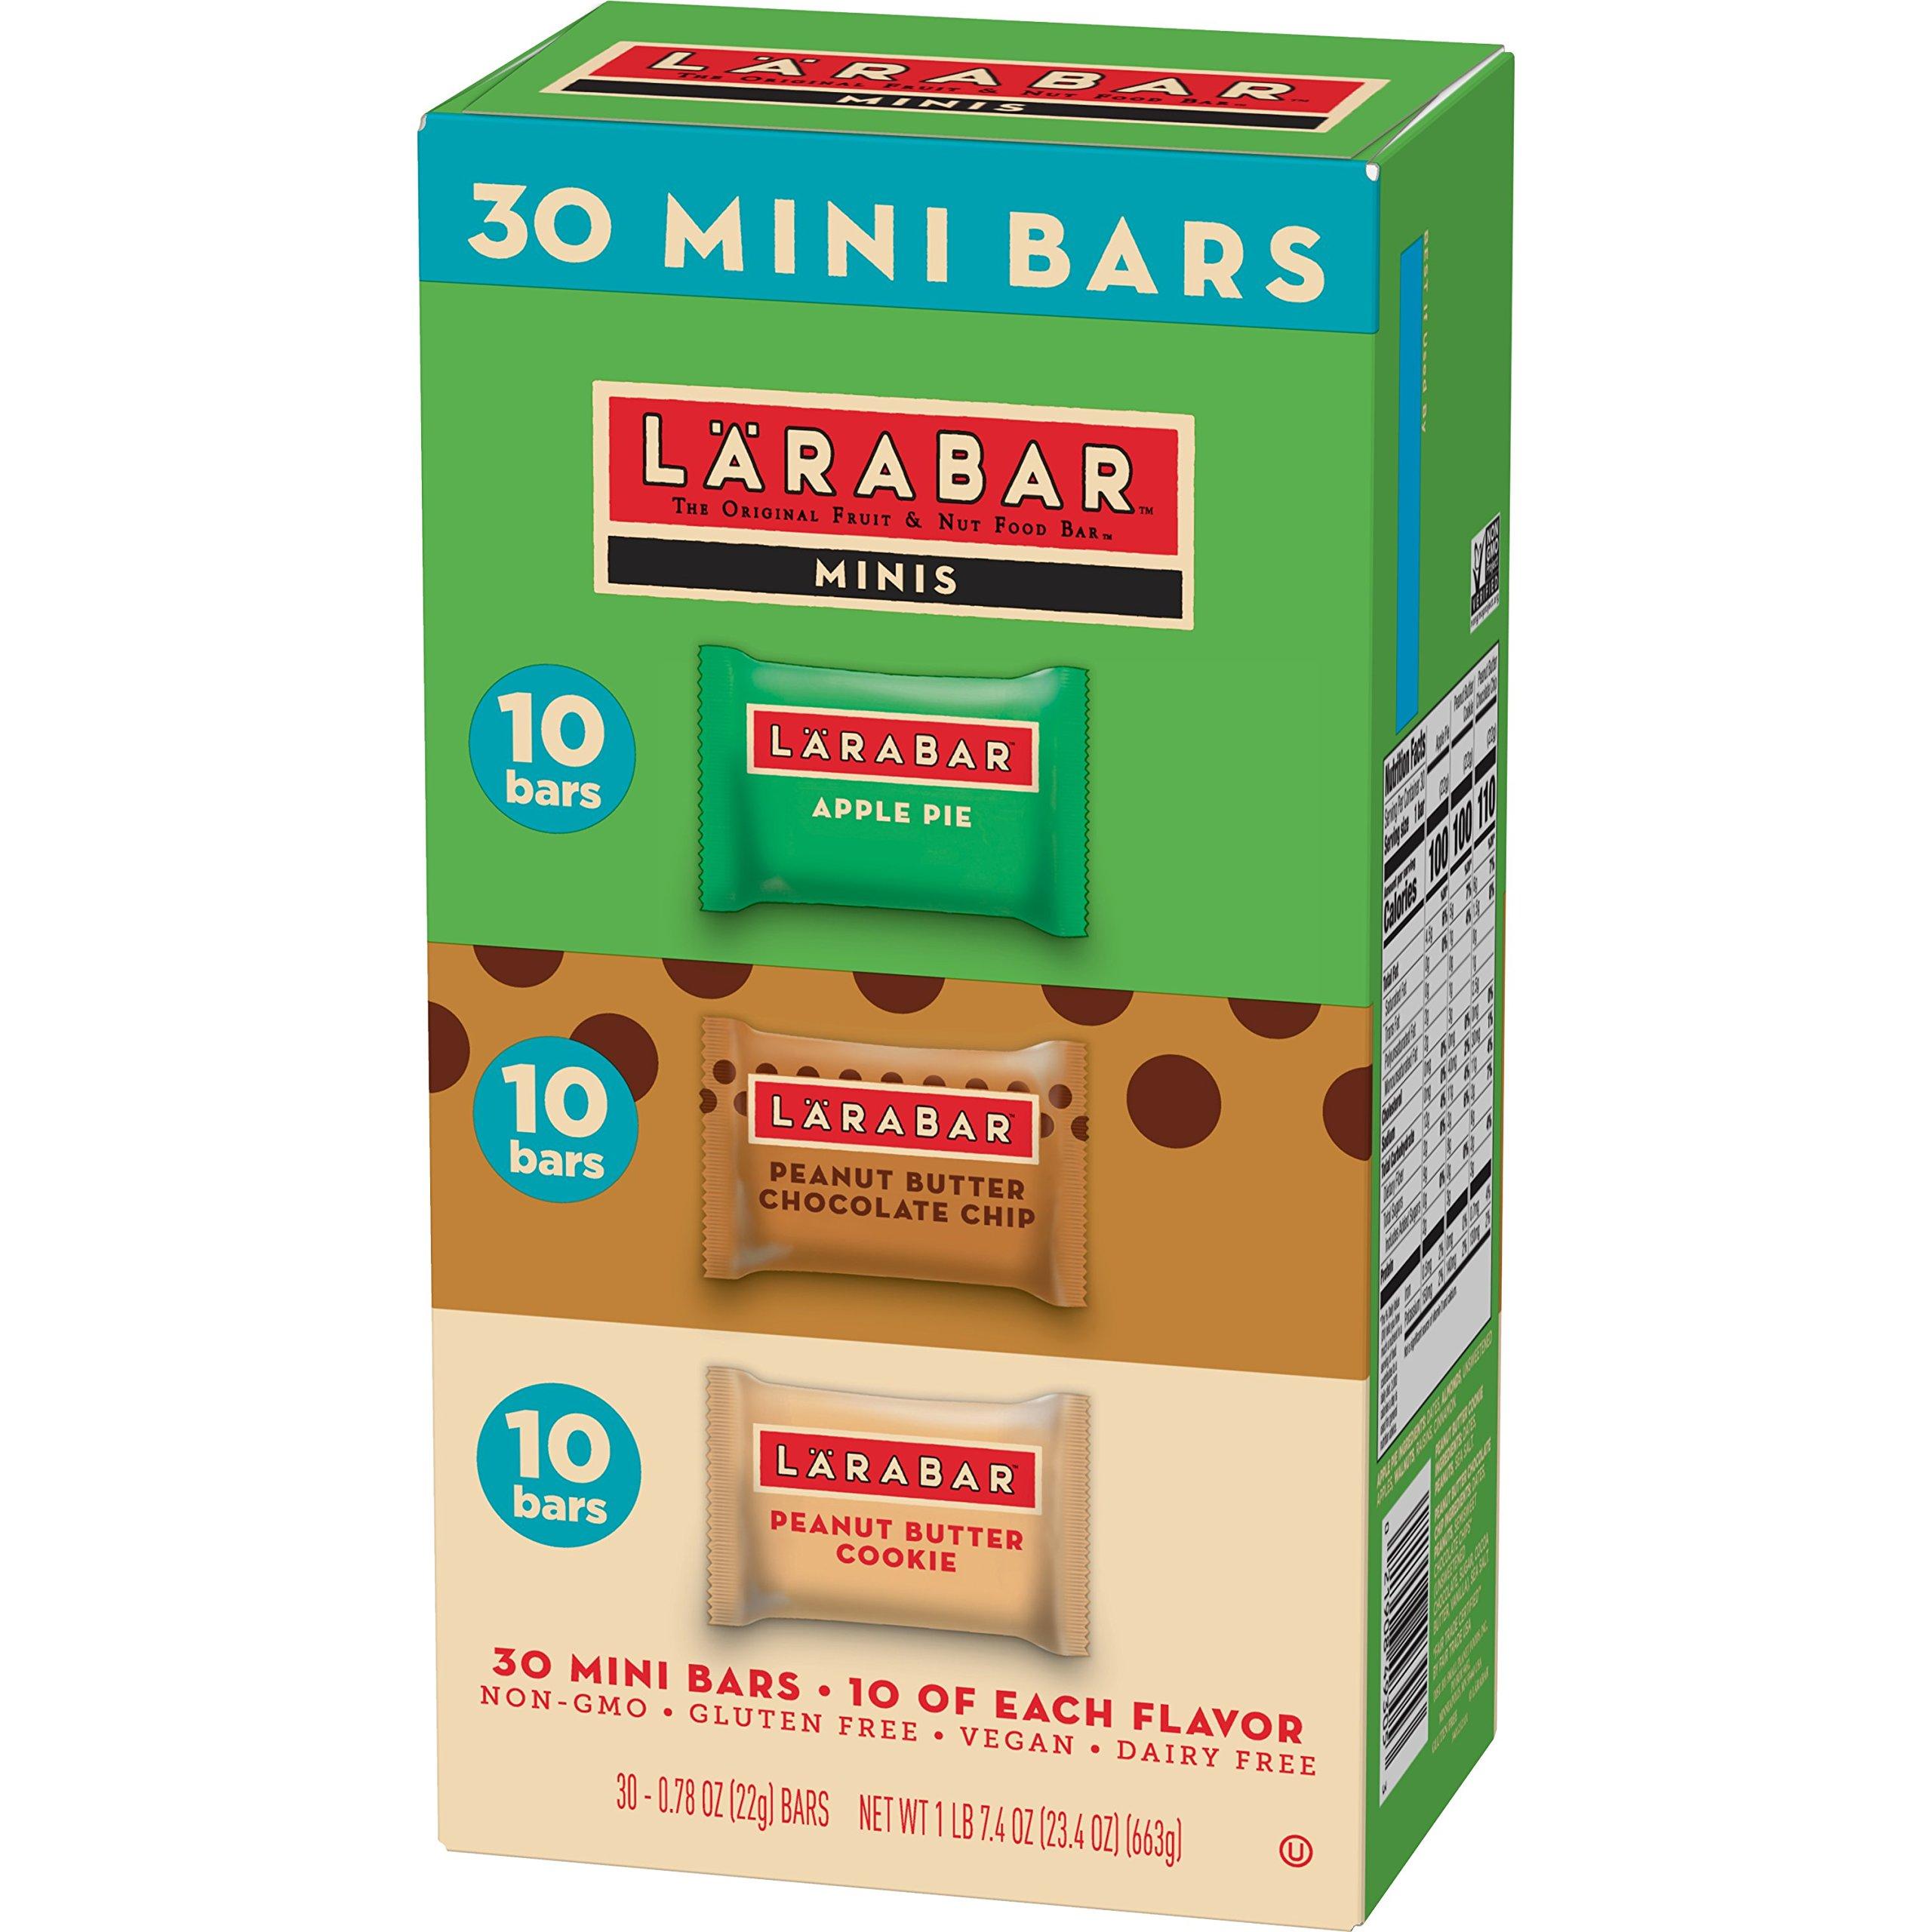 Larabar Minis Gluten Free Bar Variety Pack, Apple Pie, Peanut Butter & Chocolate Chip Cookie, 0.78 oz Bars (30 Count), Vegan, Dairy Free, Gluten Free Snacks by LÄRABAR